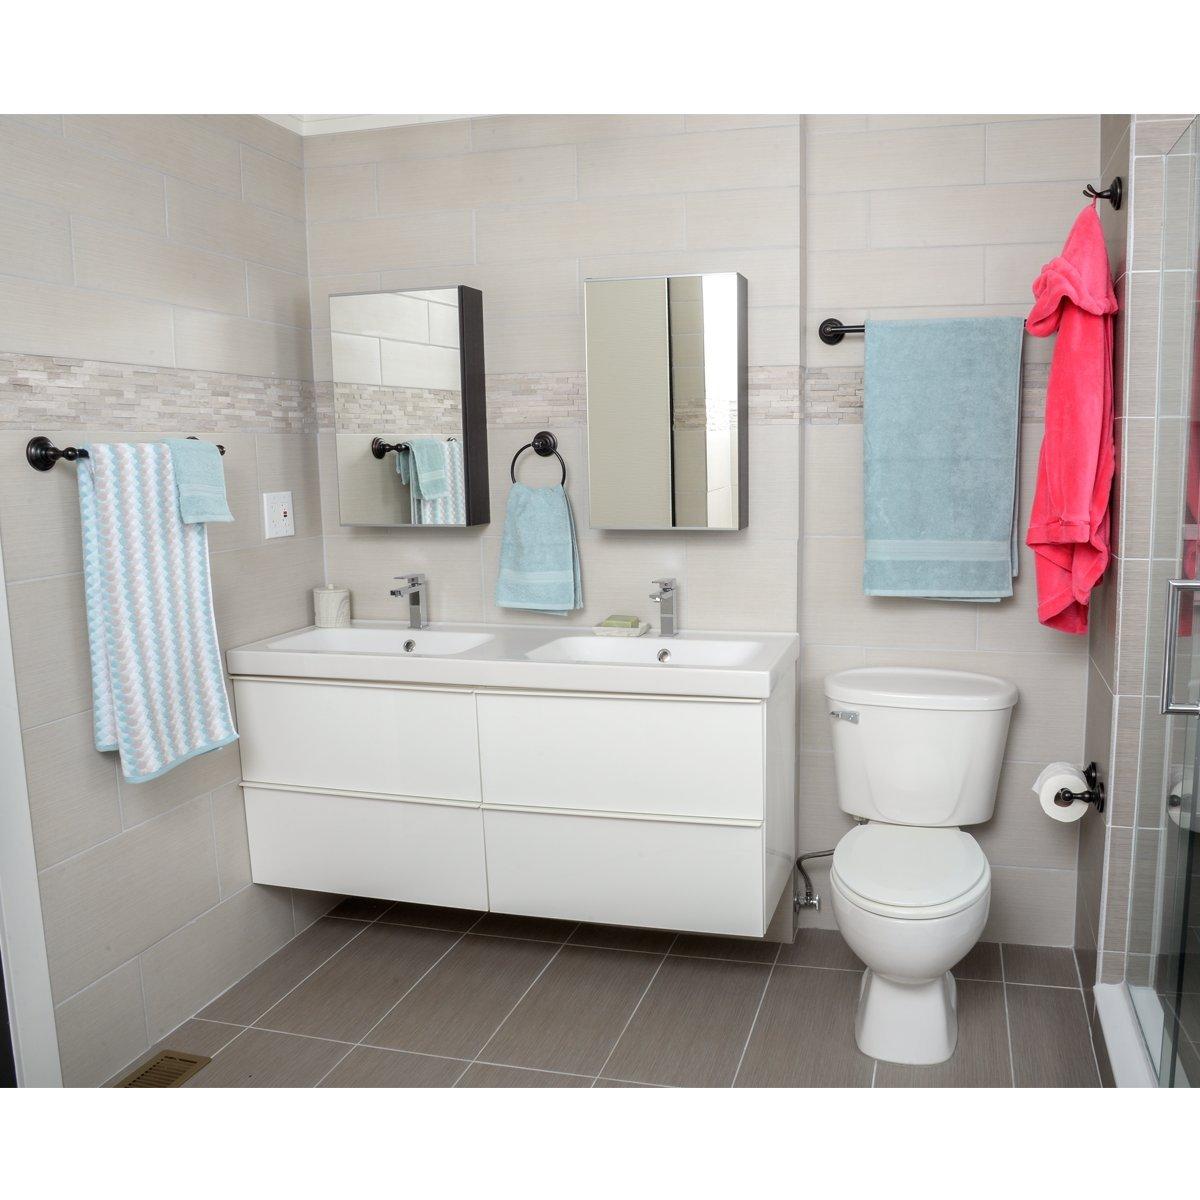 Basics Ensemble de 5/accessoires de salle de bain Traditionnel Nickel satin/é